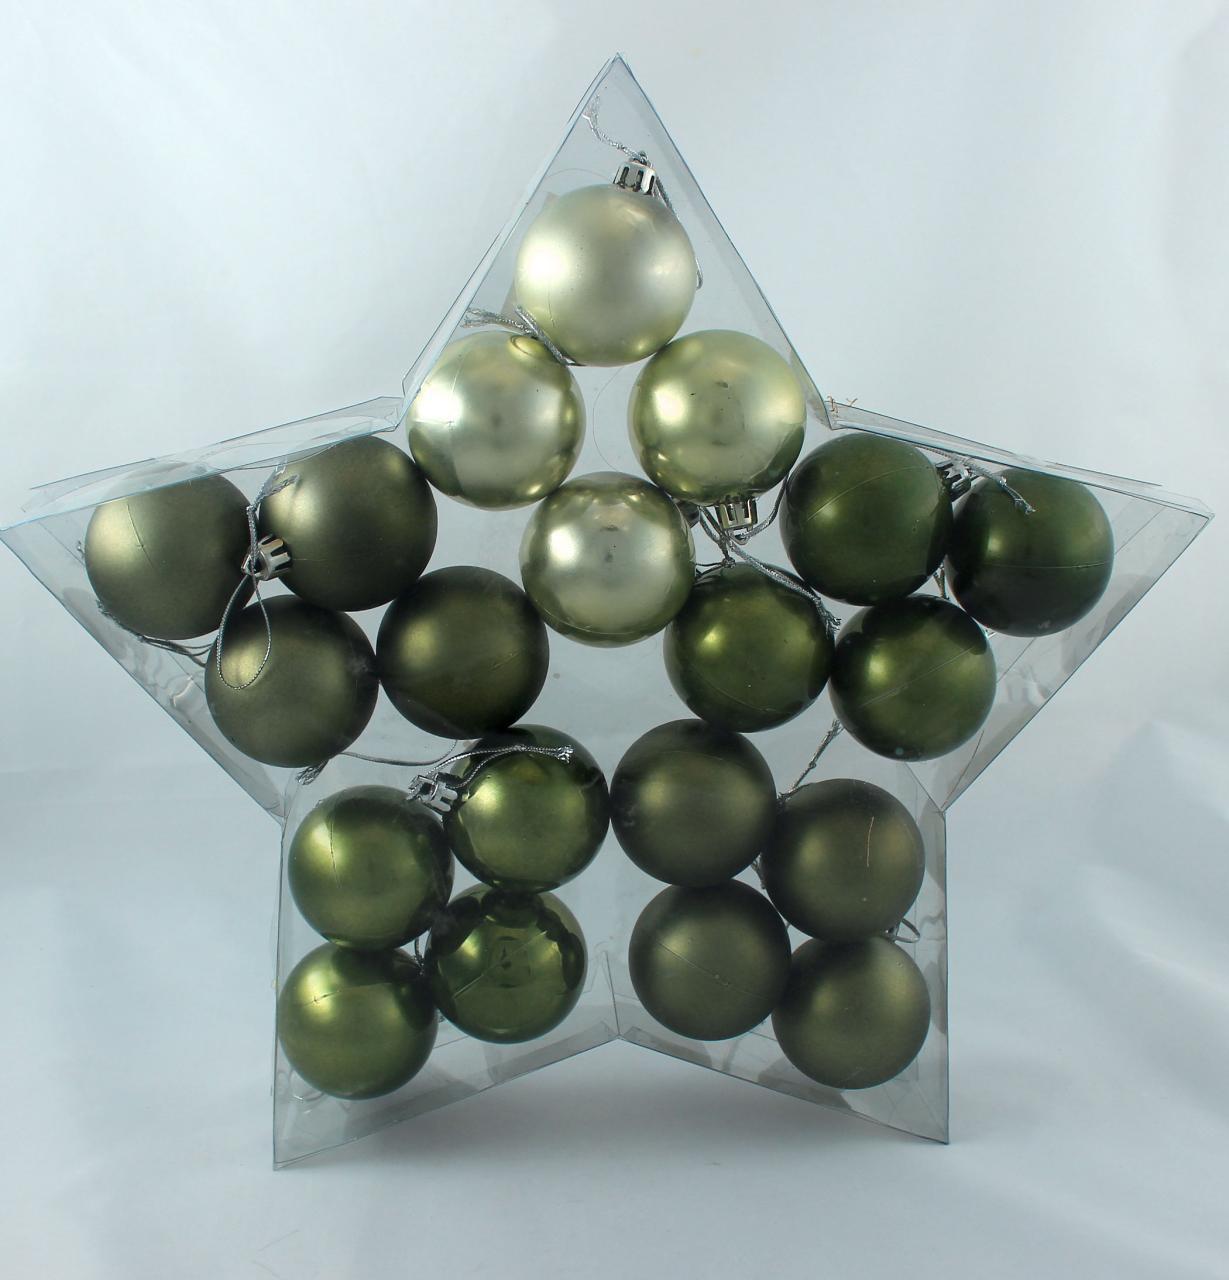 weihnachtskugel plastik 5cm woodland 20st preiswert online kaufen. Black Bedroom Furniture Sets. Home Design Ideas